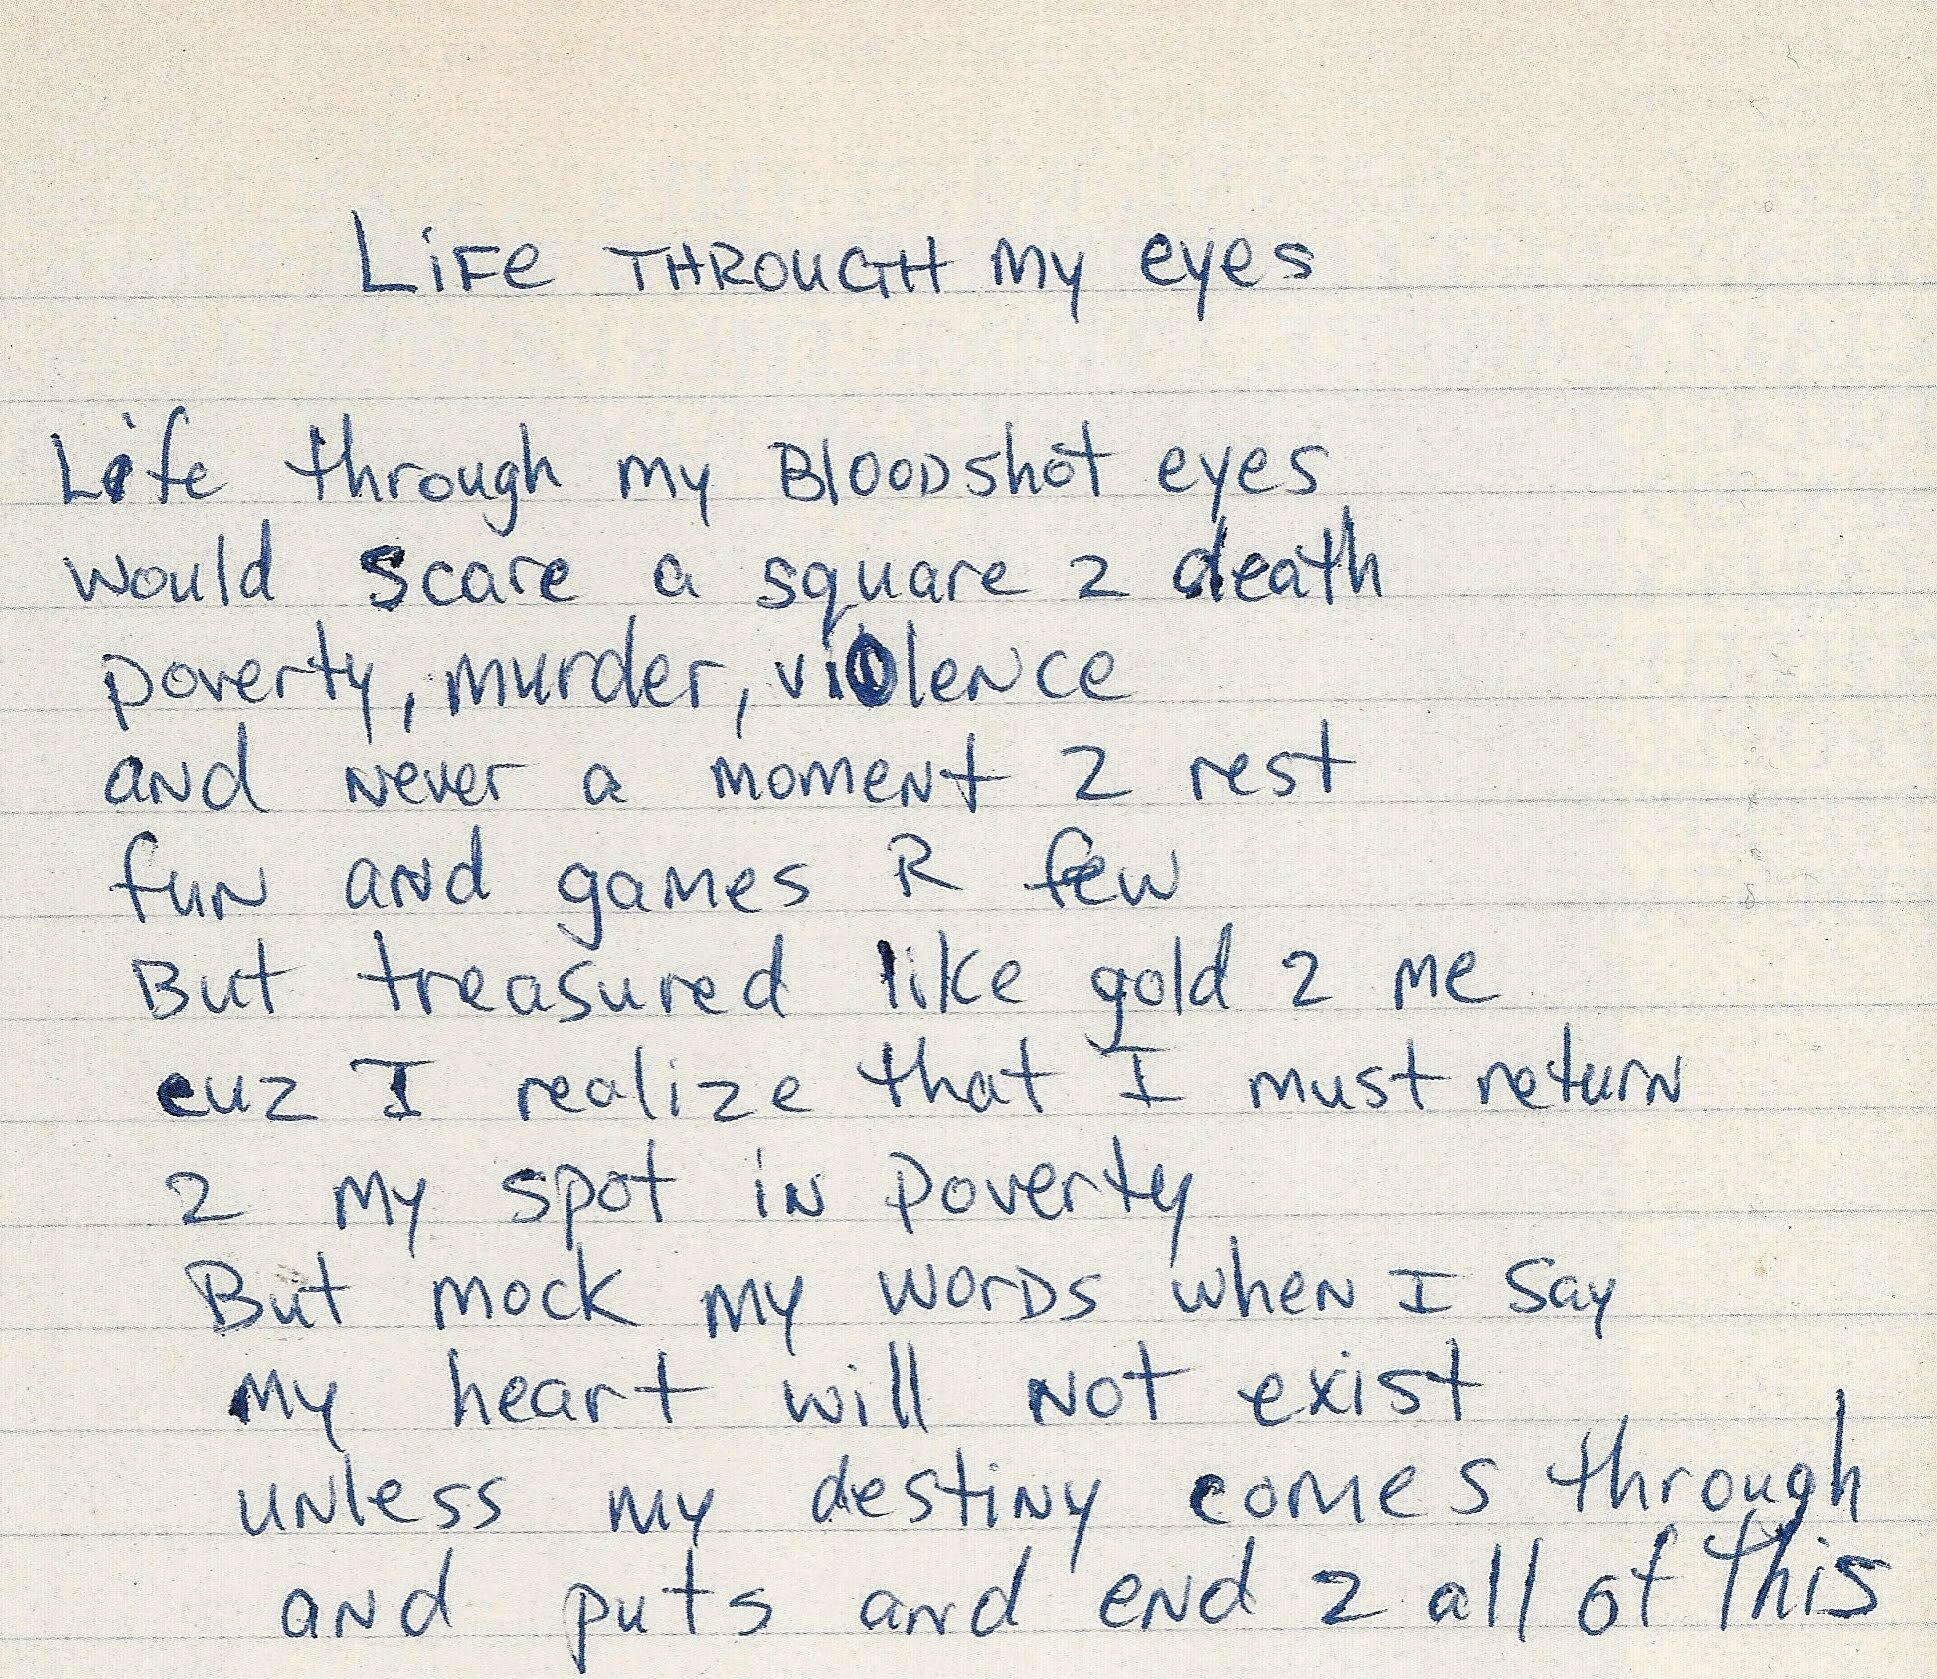 Life Through My Eyes  - Tupac's Handwritten Poem